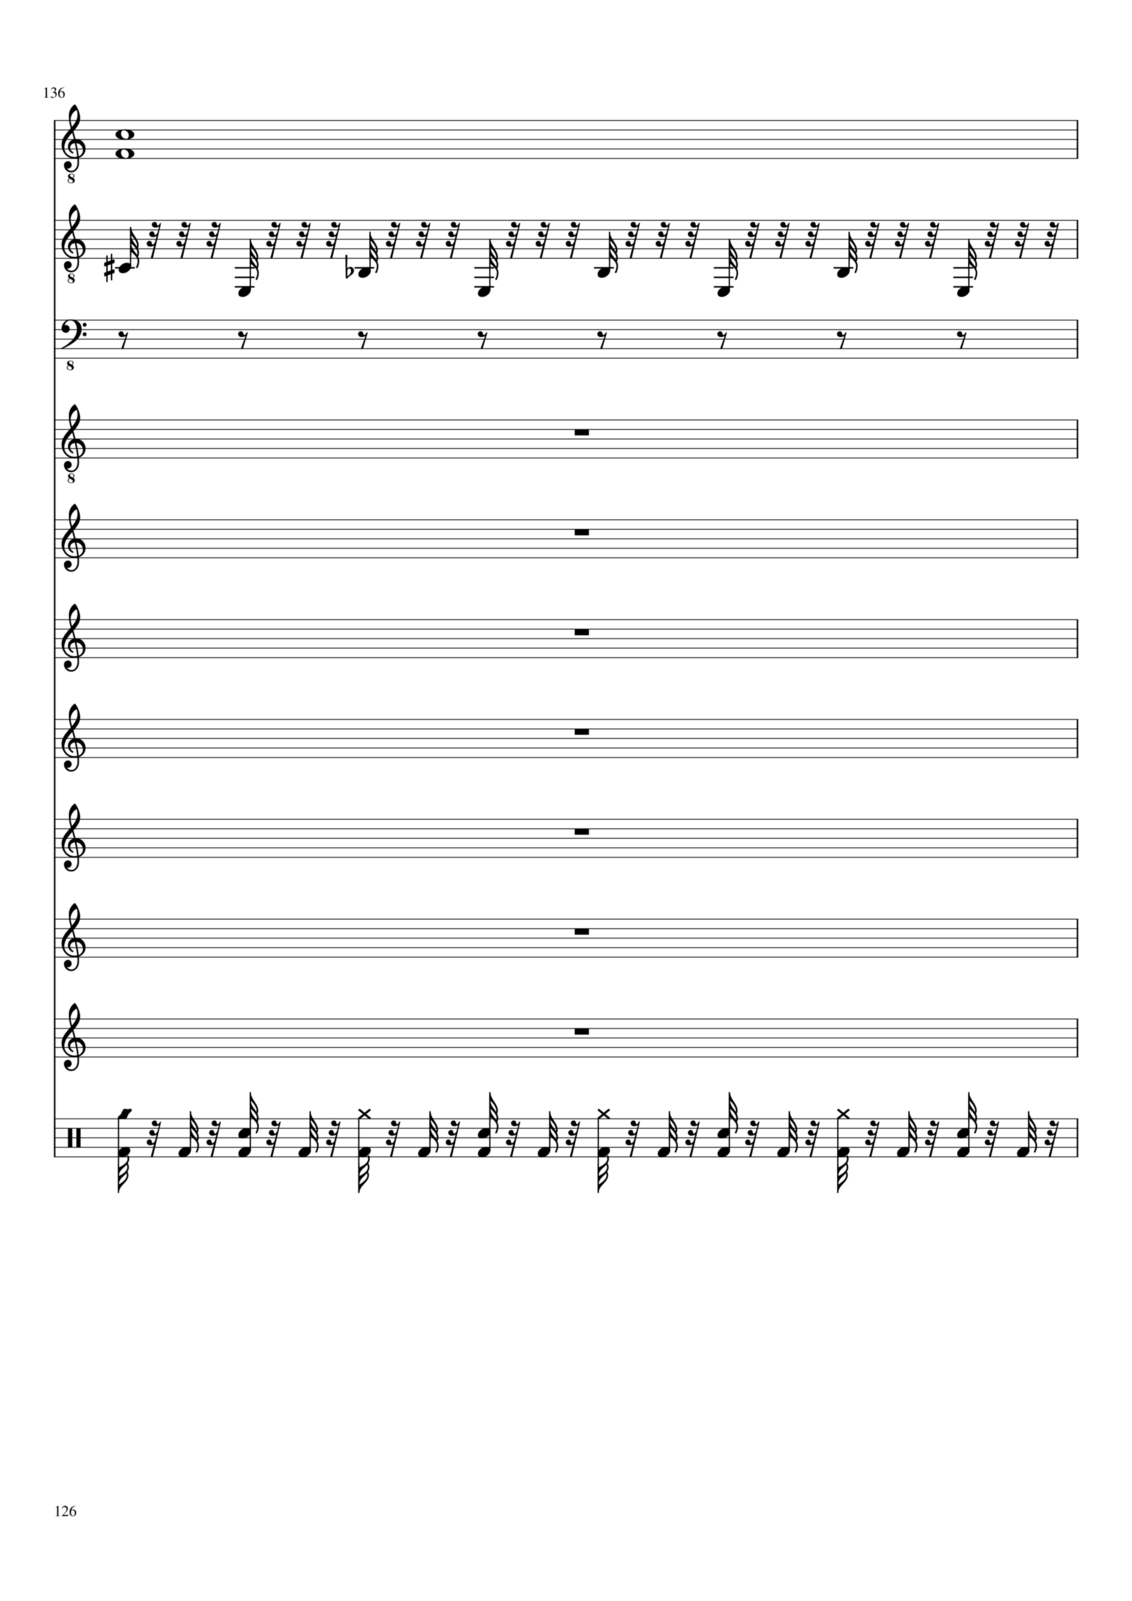 Belyiy sokol slide, Image 126